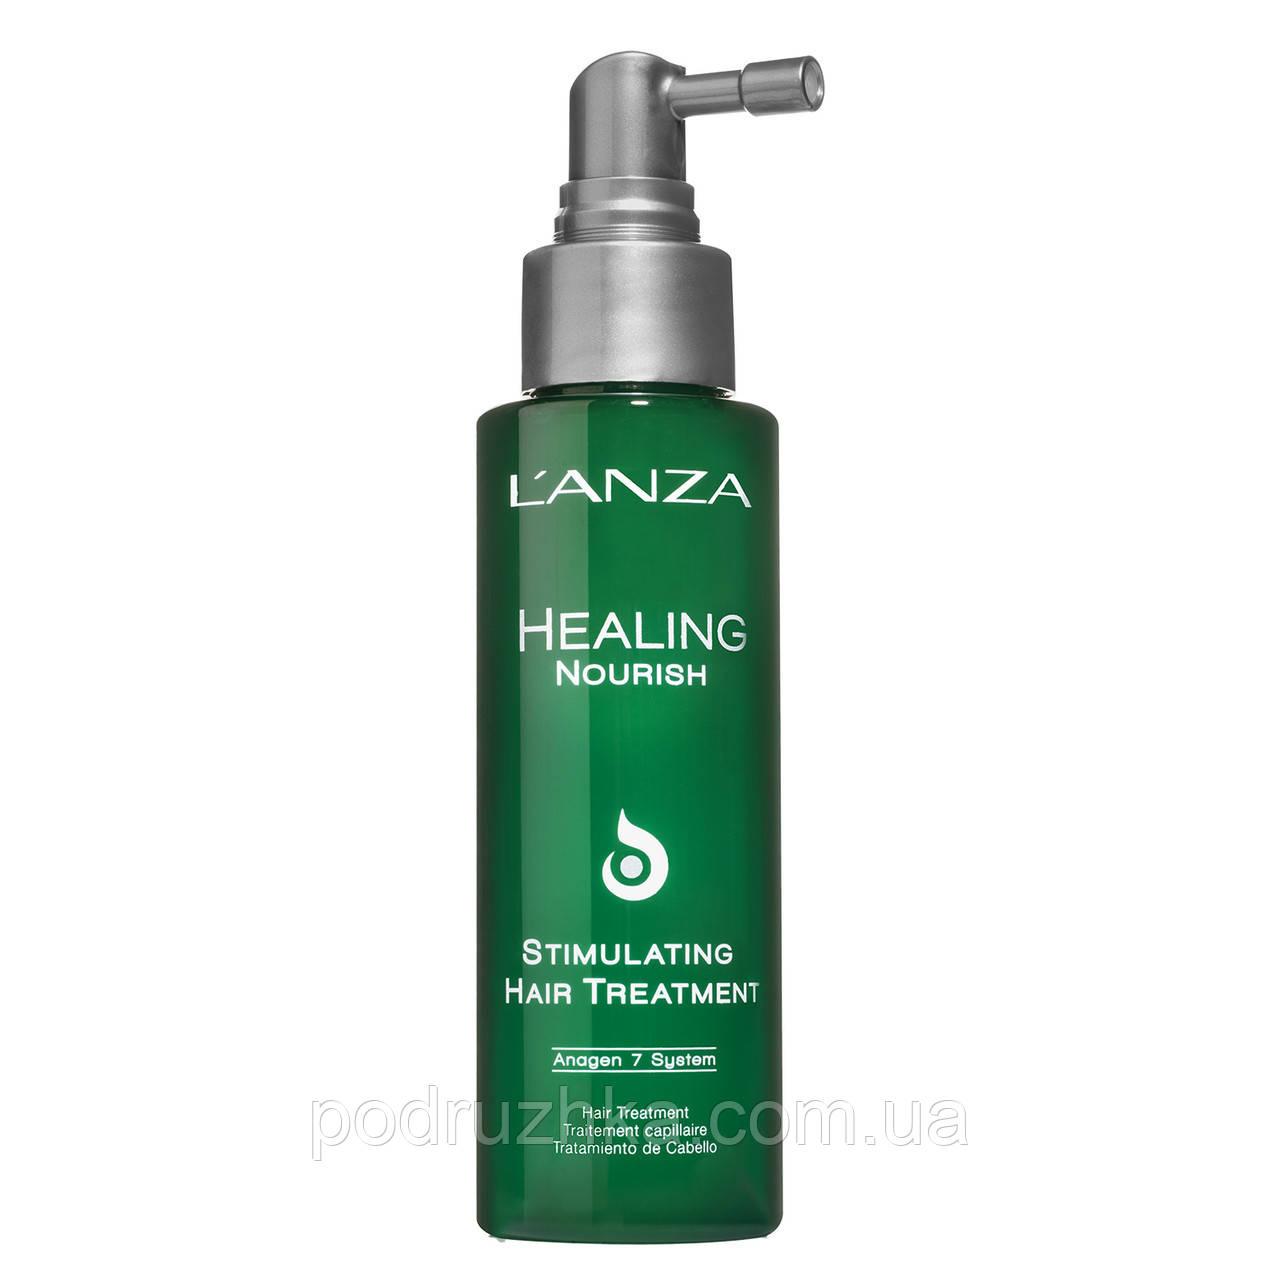 Lanza healing nourish stimulating treatment Спрей для стимуляции роста волос ph: 5.1, 100 мл